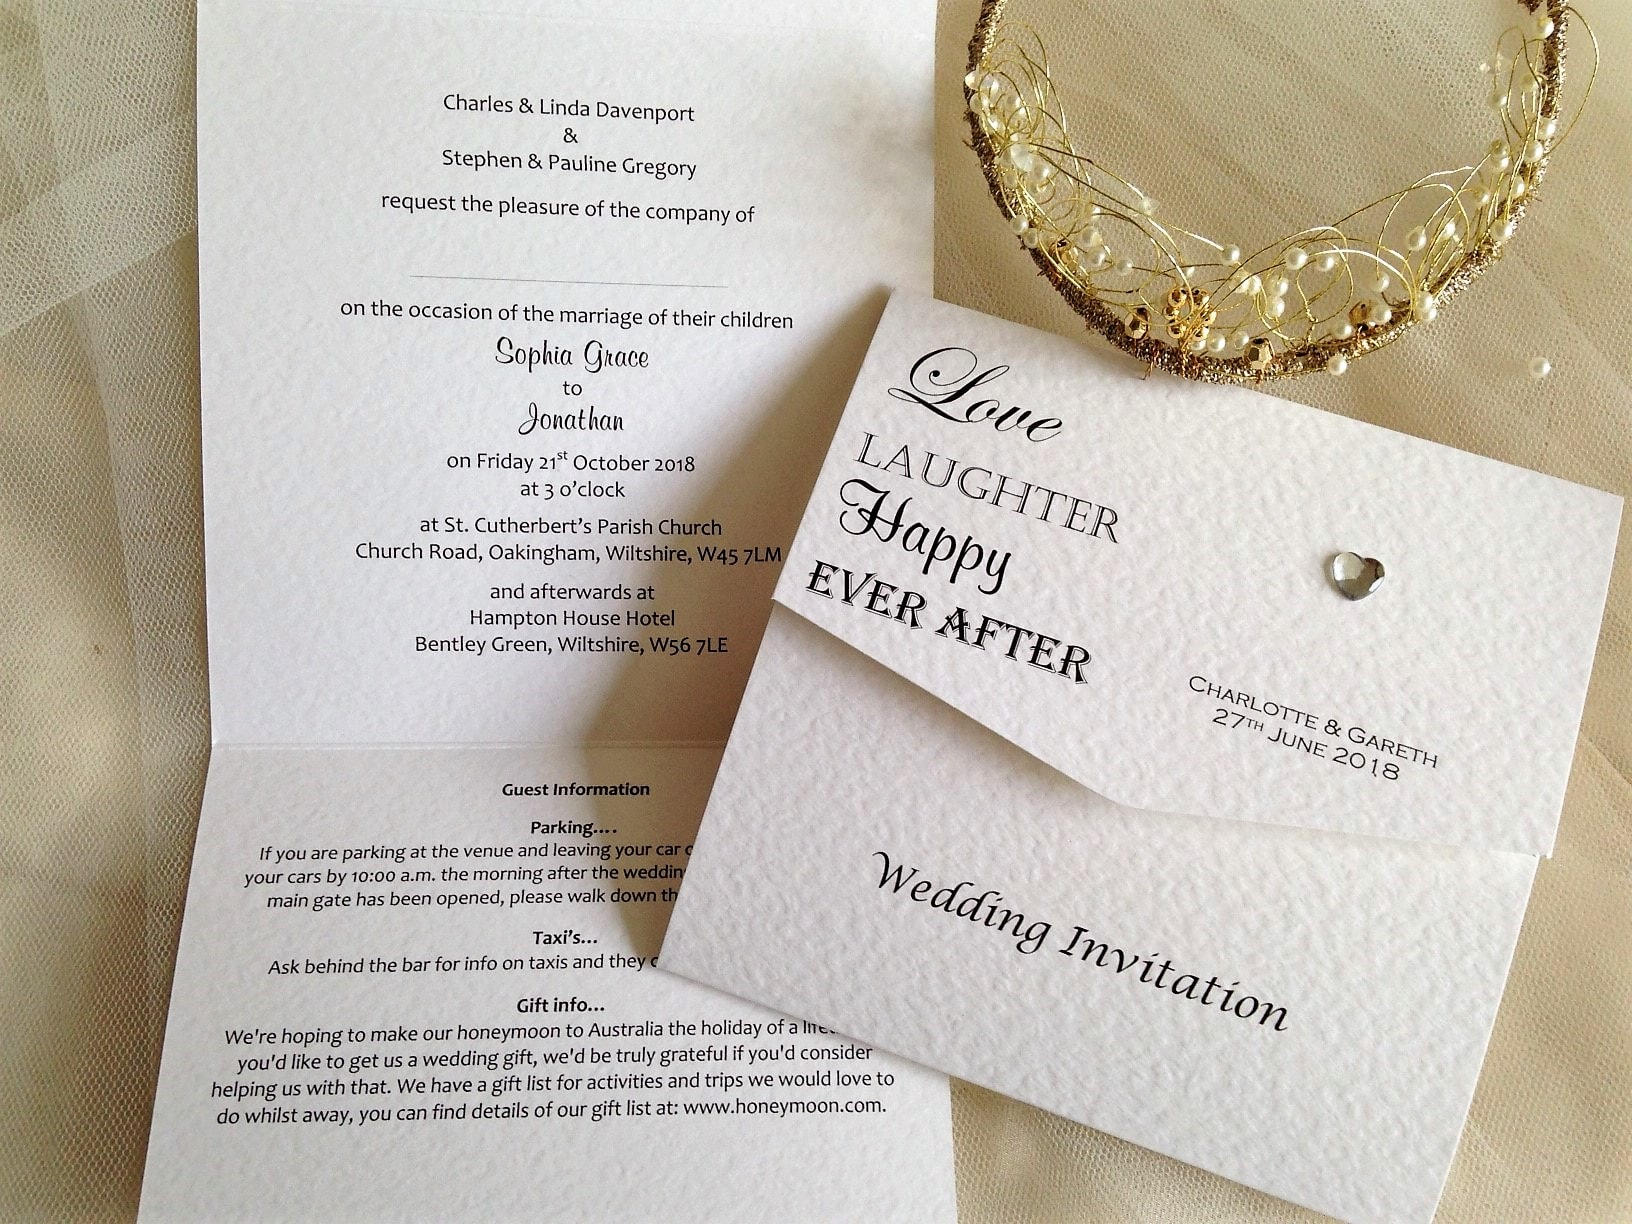 Fold Wedding Invitations: Love Laughter Tri Fold Wedding Invitations £1.50